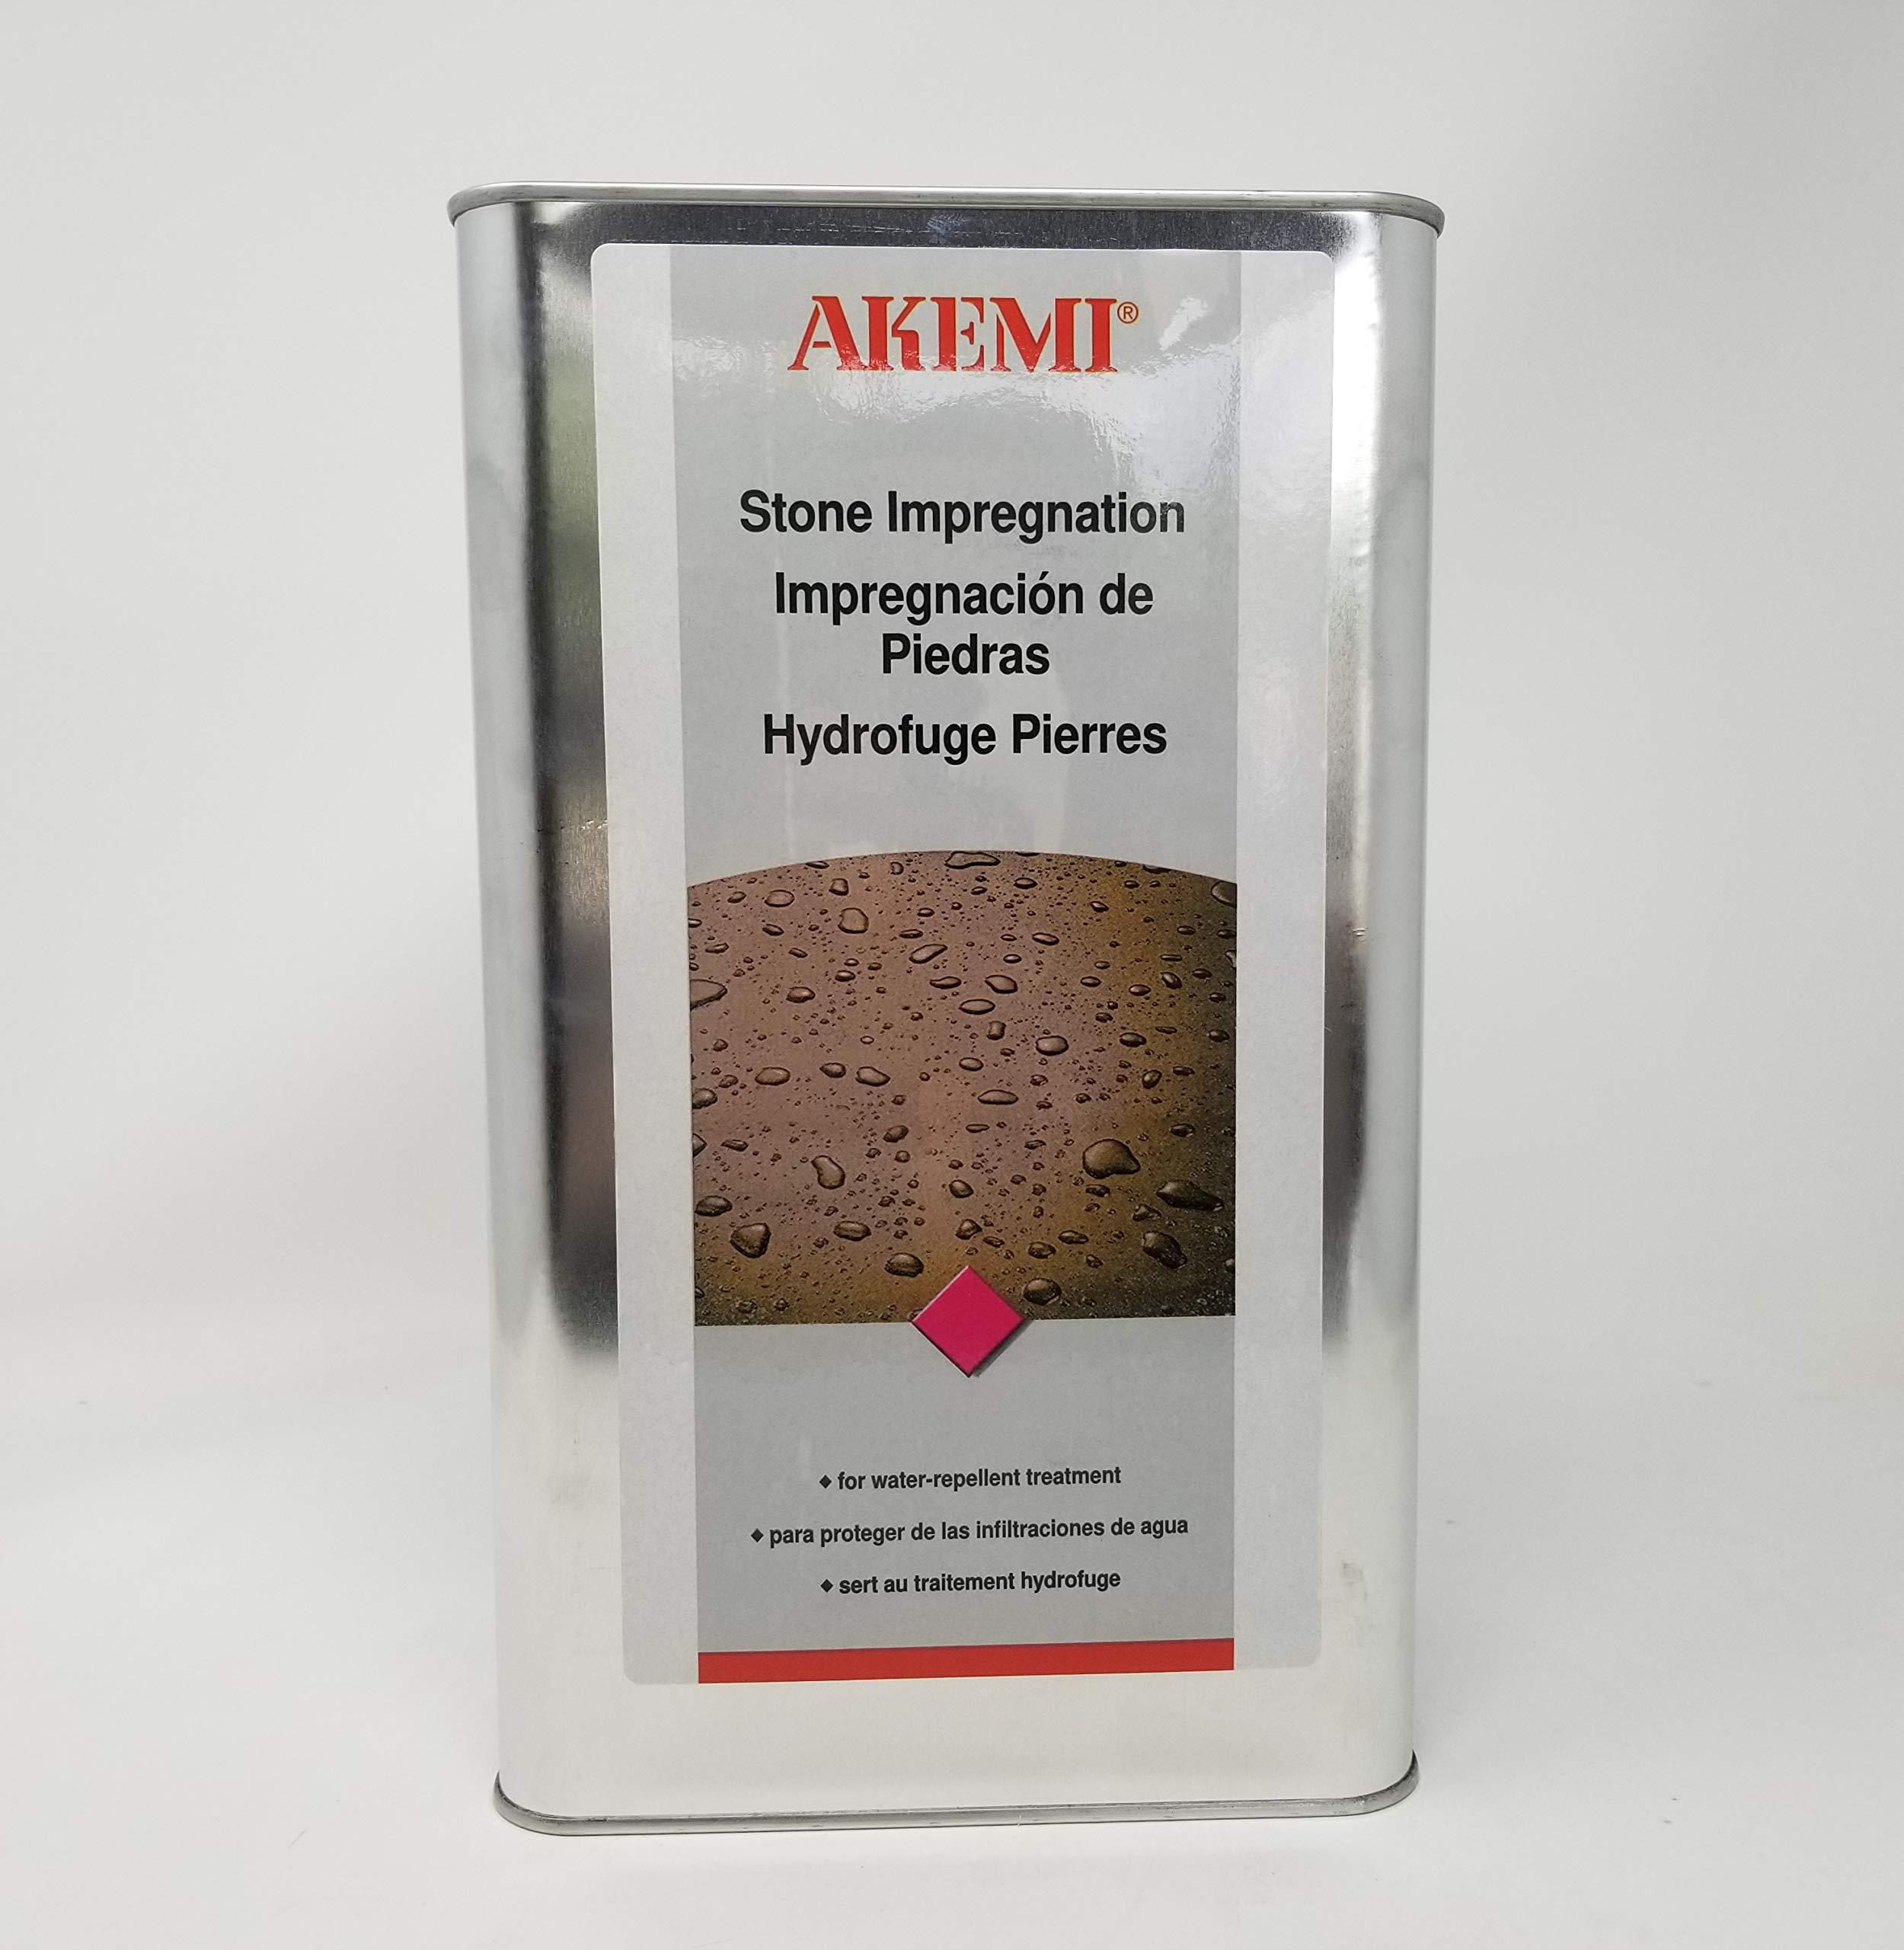 Akemi Stone Impregnation - 5 Liter by Akemi